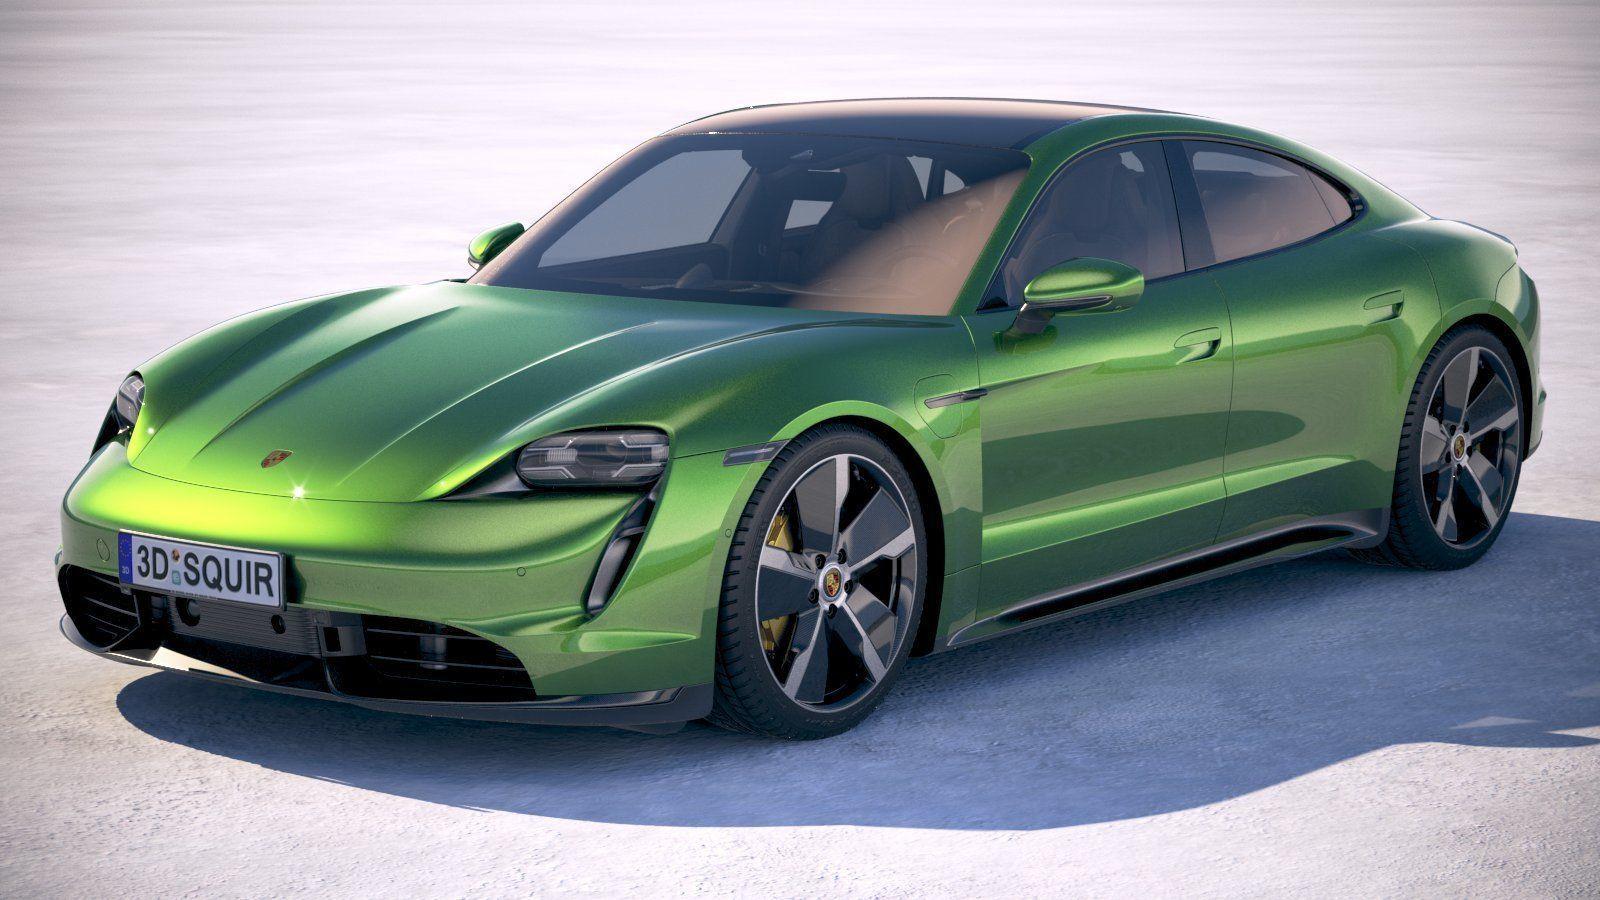 Porsche Taycan Turbo S 2020 VRAY